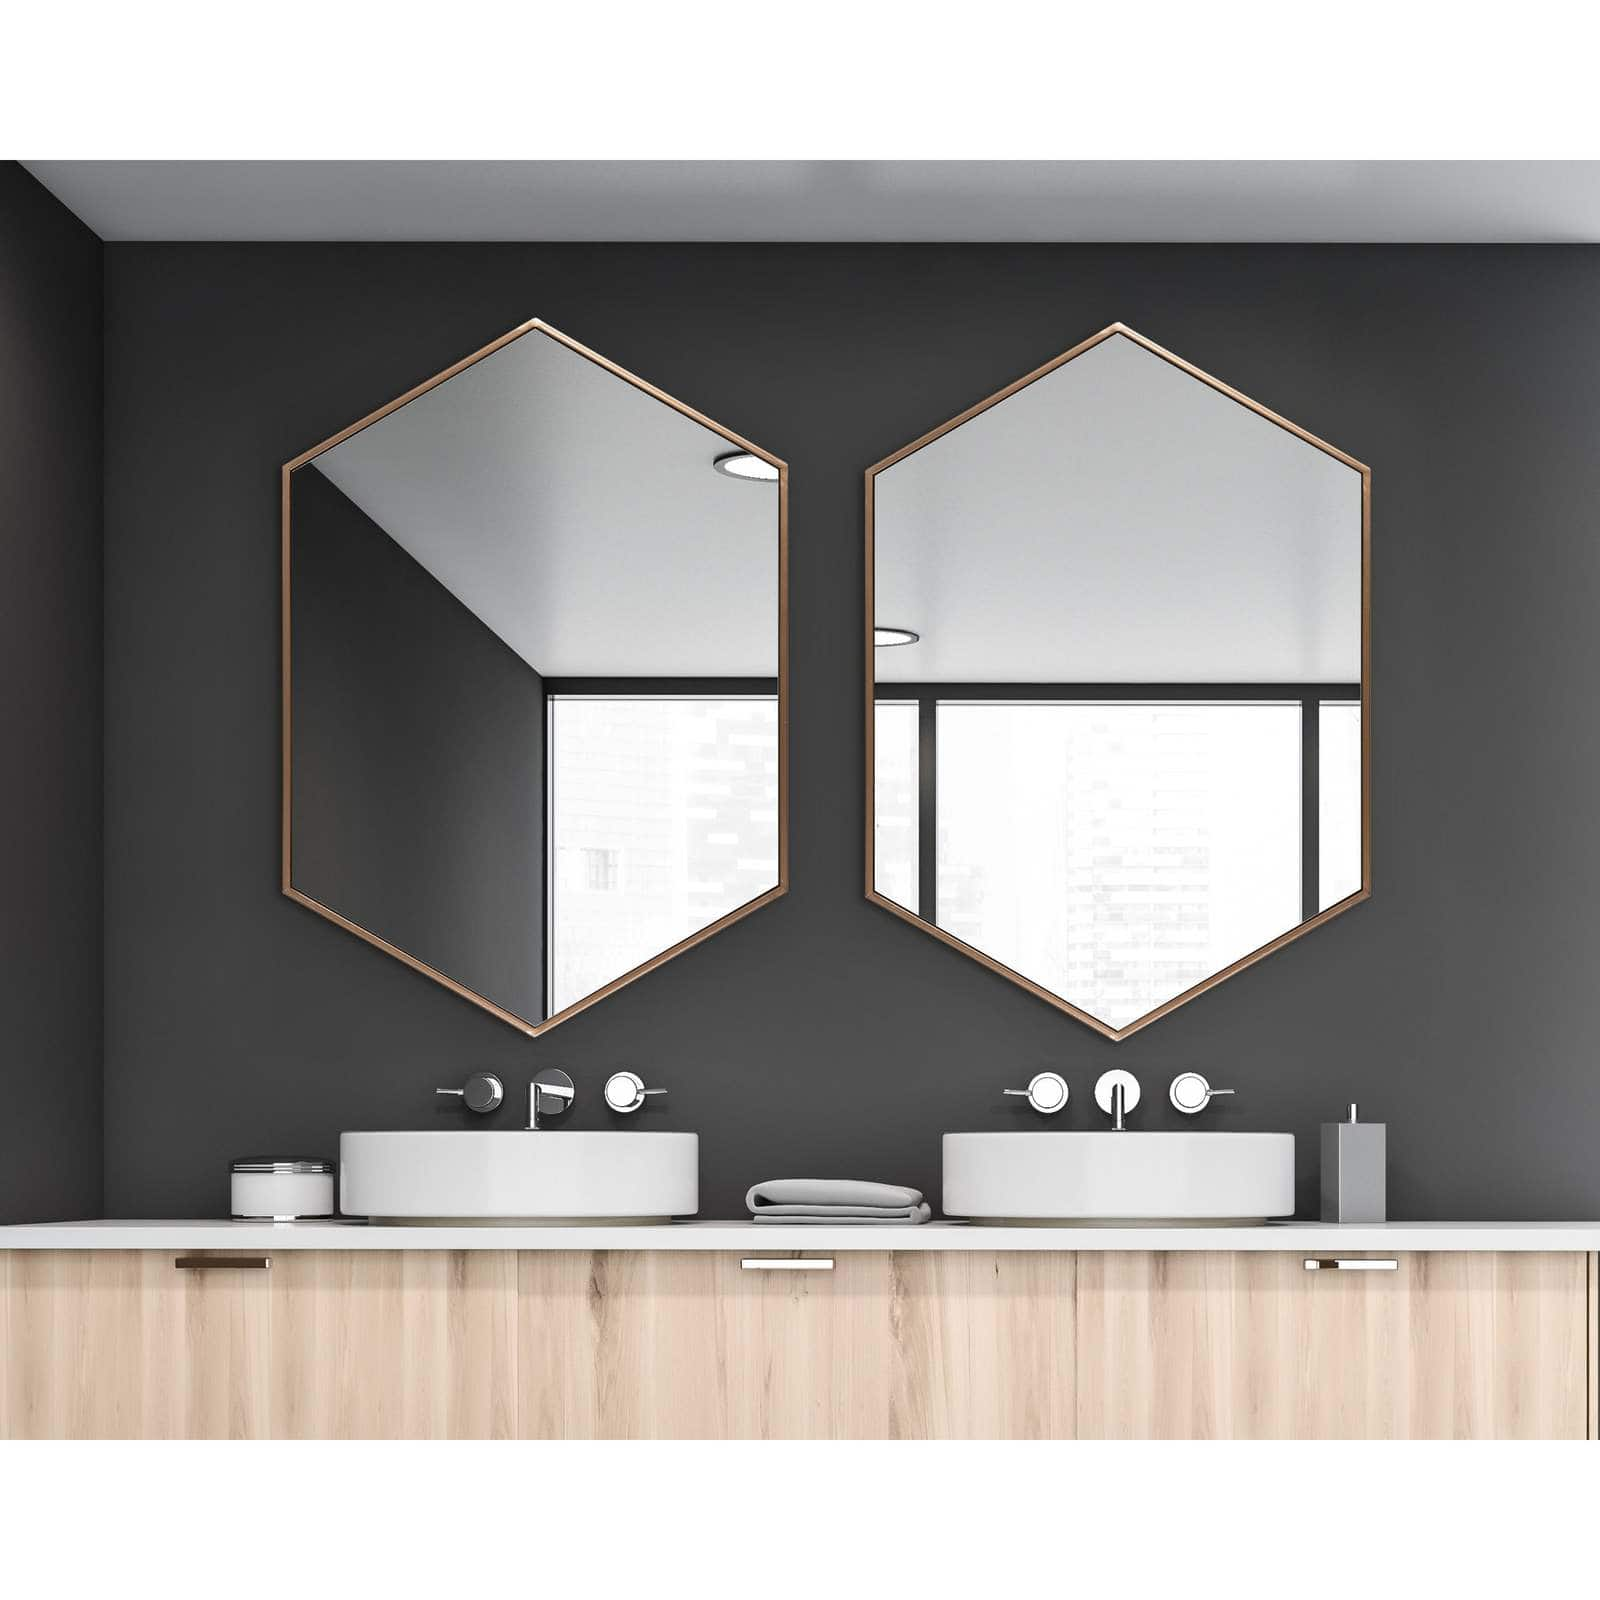 Hexagonal Metal Wall Mirror